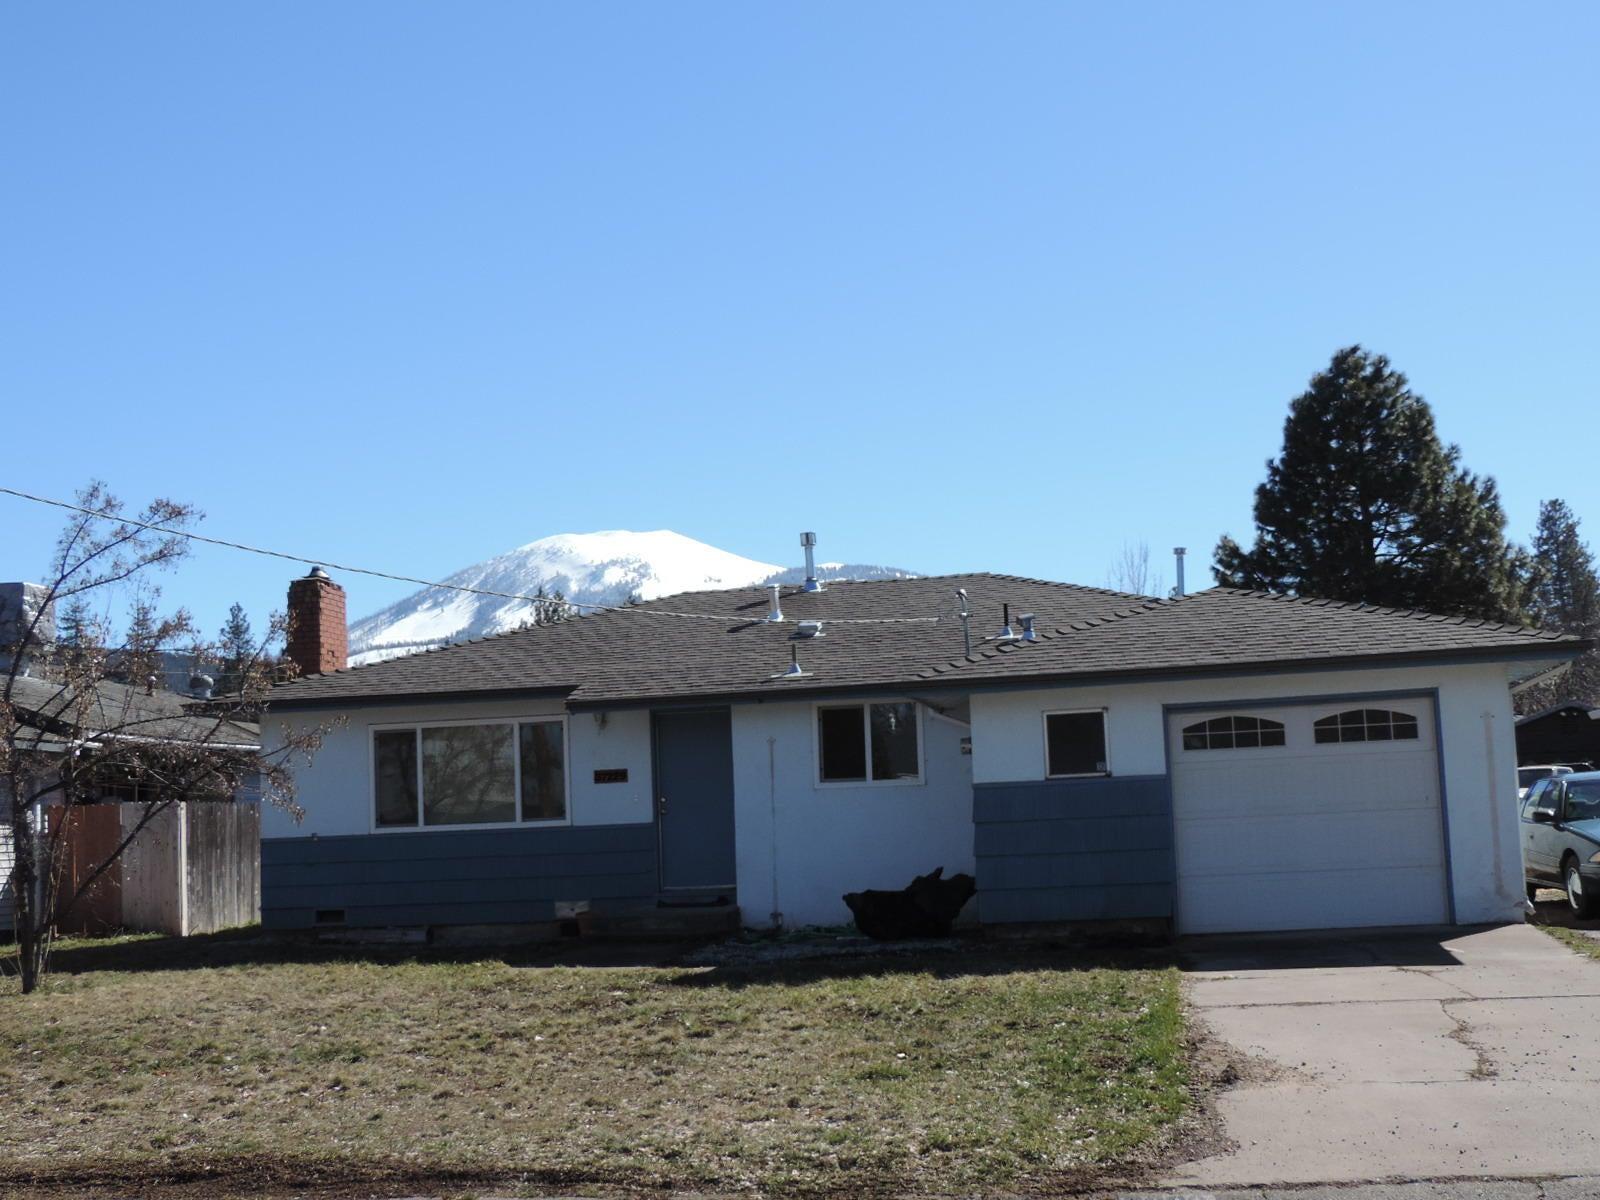 37229 Ontario Ave, Burney, CA 96013